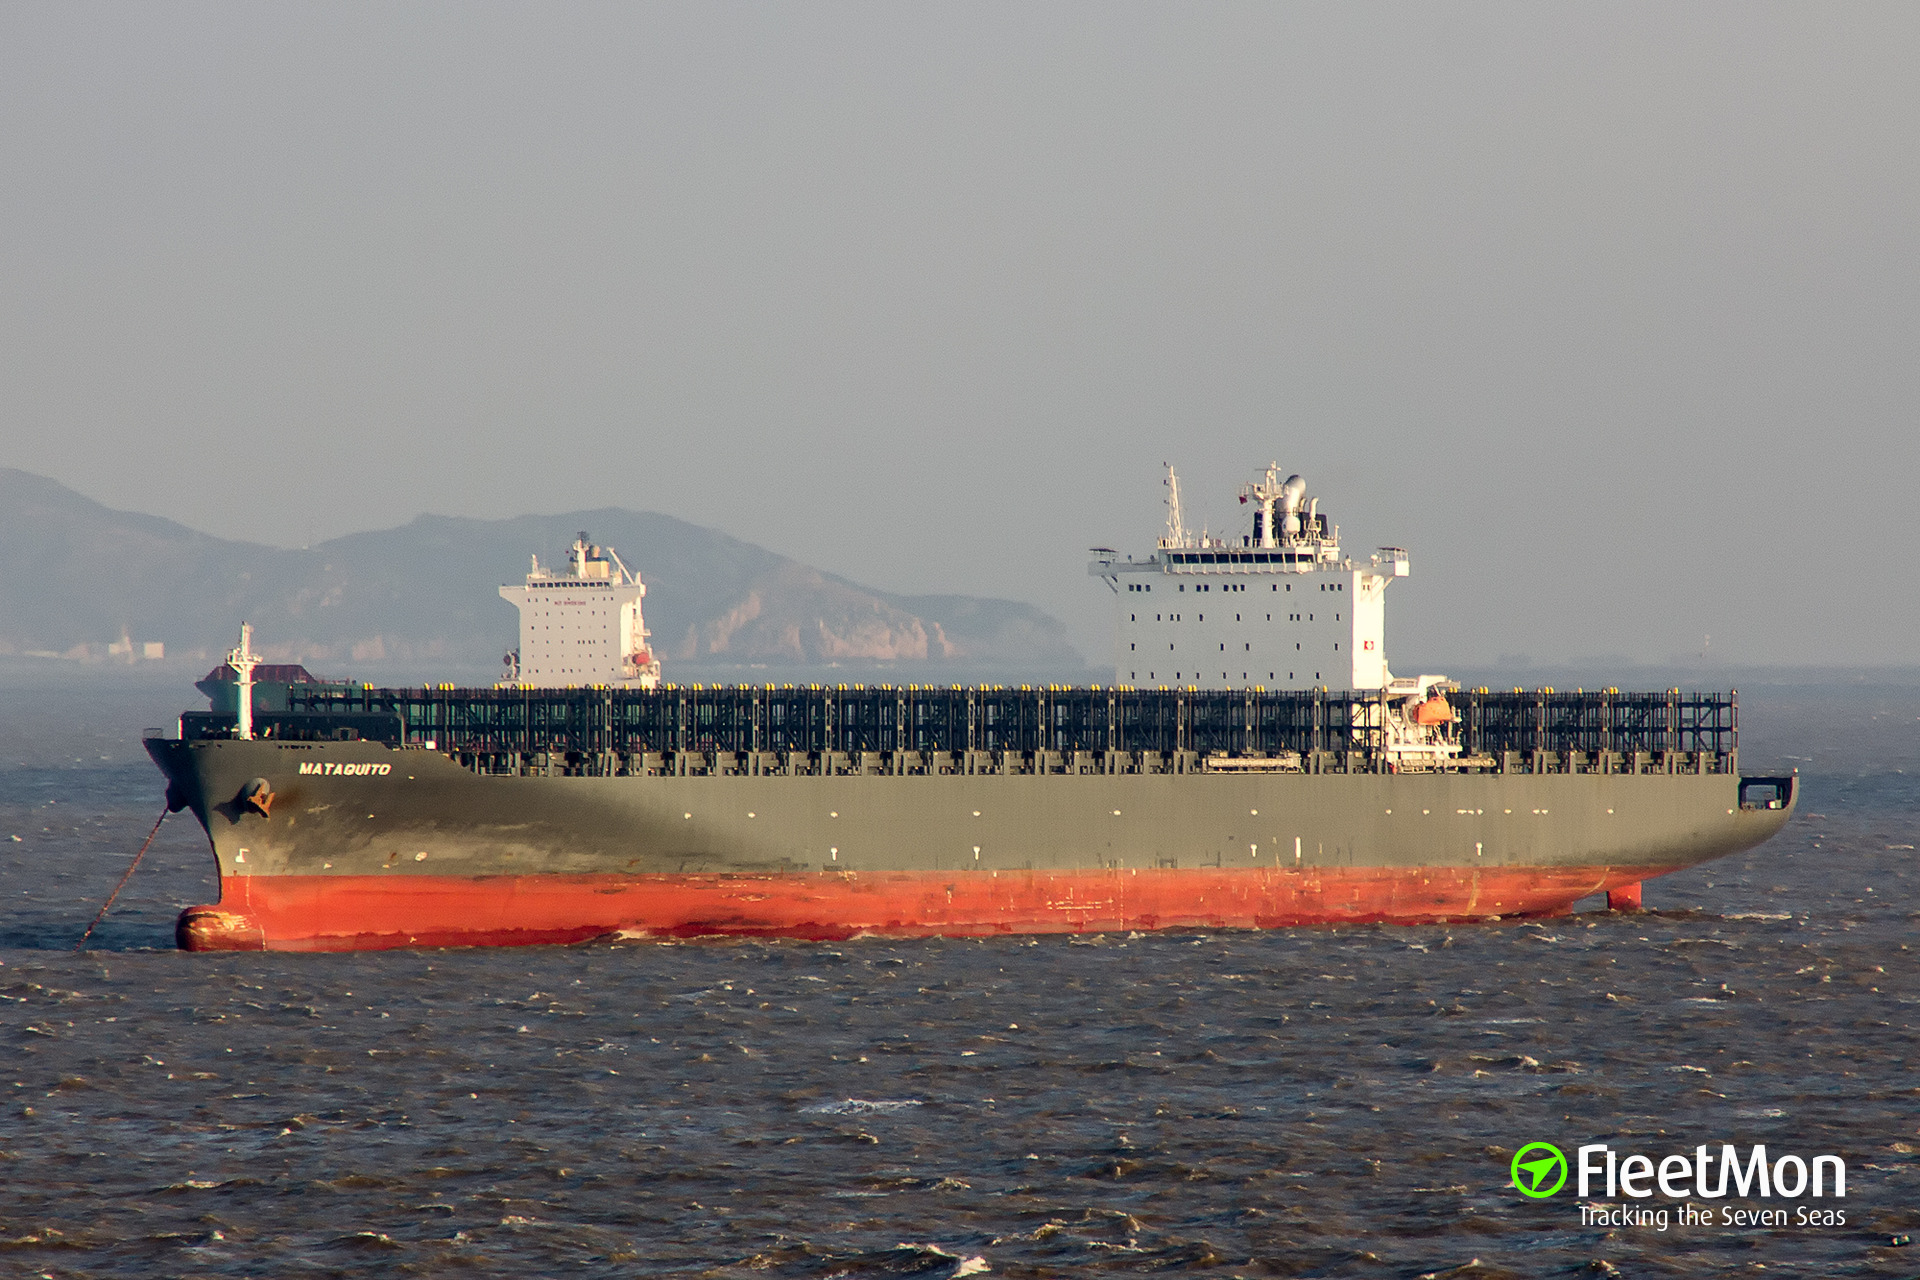 173 kilos of cocaine found on boxship MATAQUITO